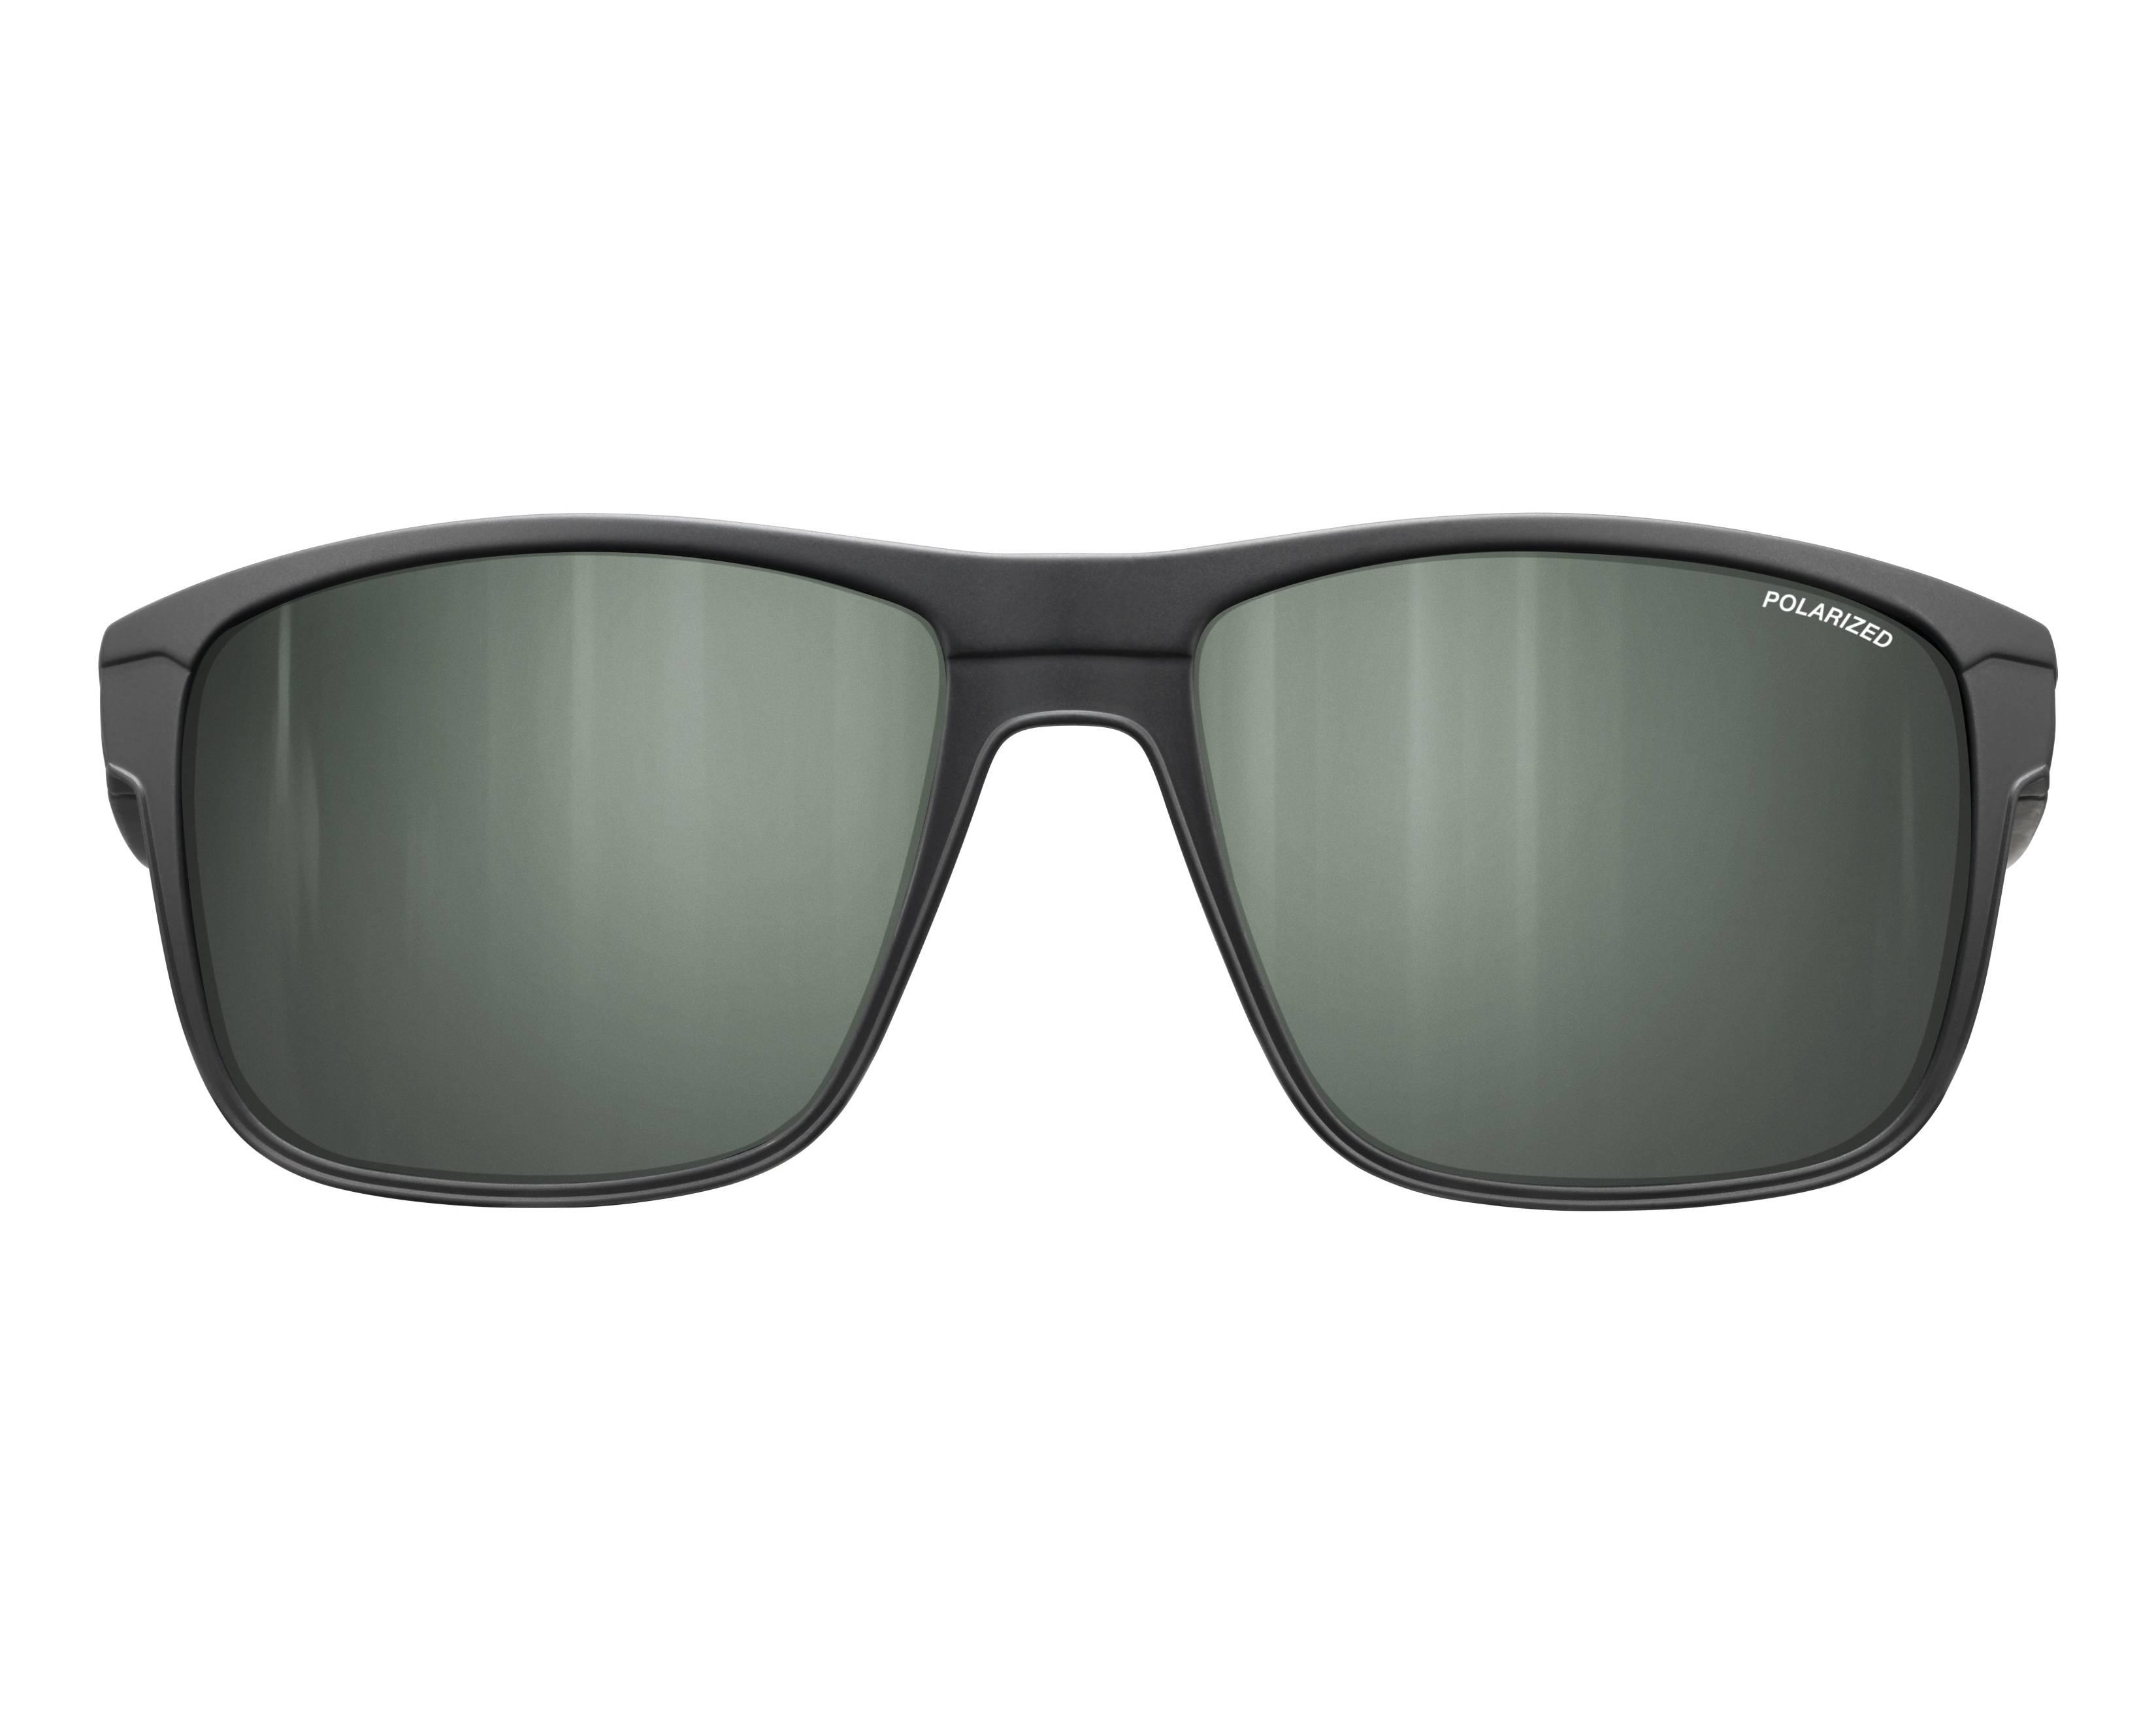 b78c44d4c25 Sunglasses Julbo J499 9023 61-17 Black front view